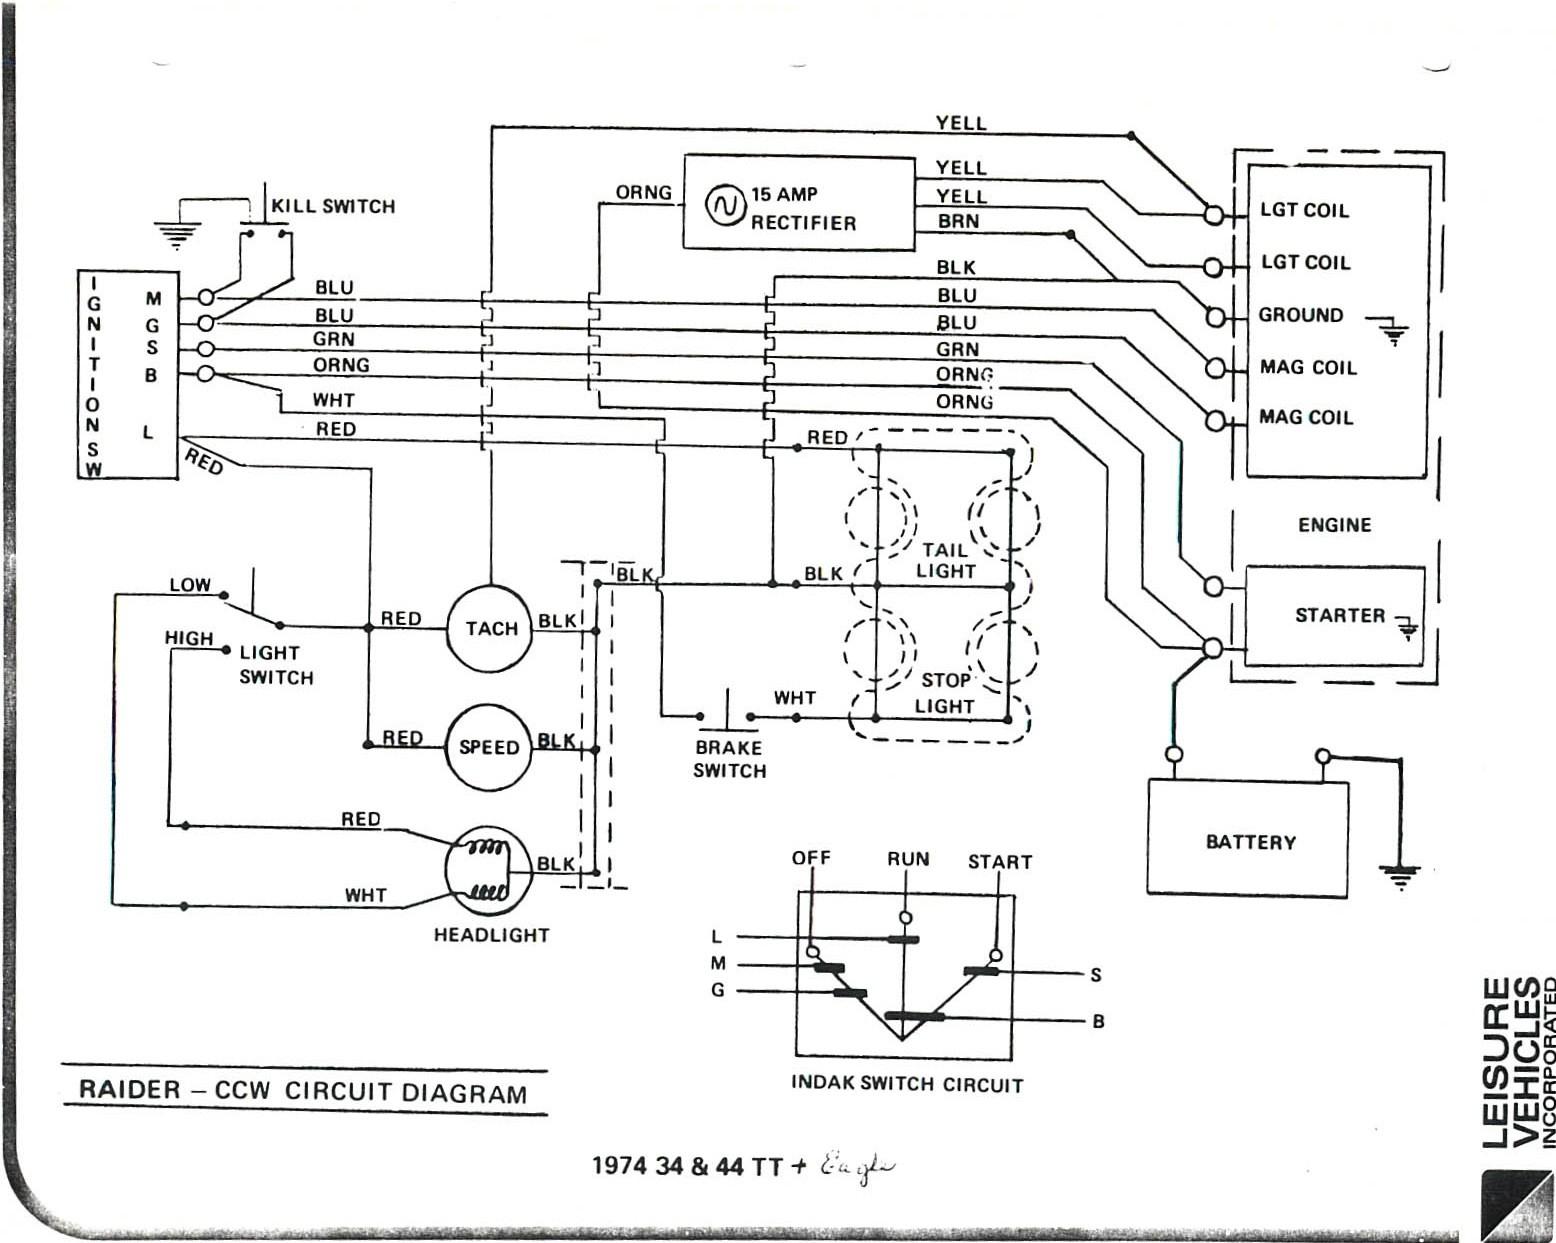 Snowmobile Engine Diagram Raider Of Snowmobile Engine Diagram